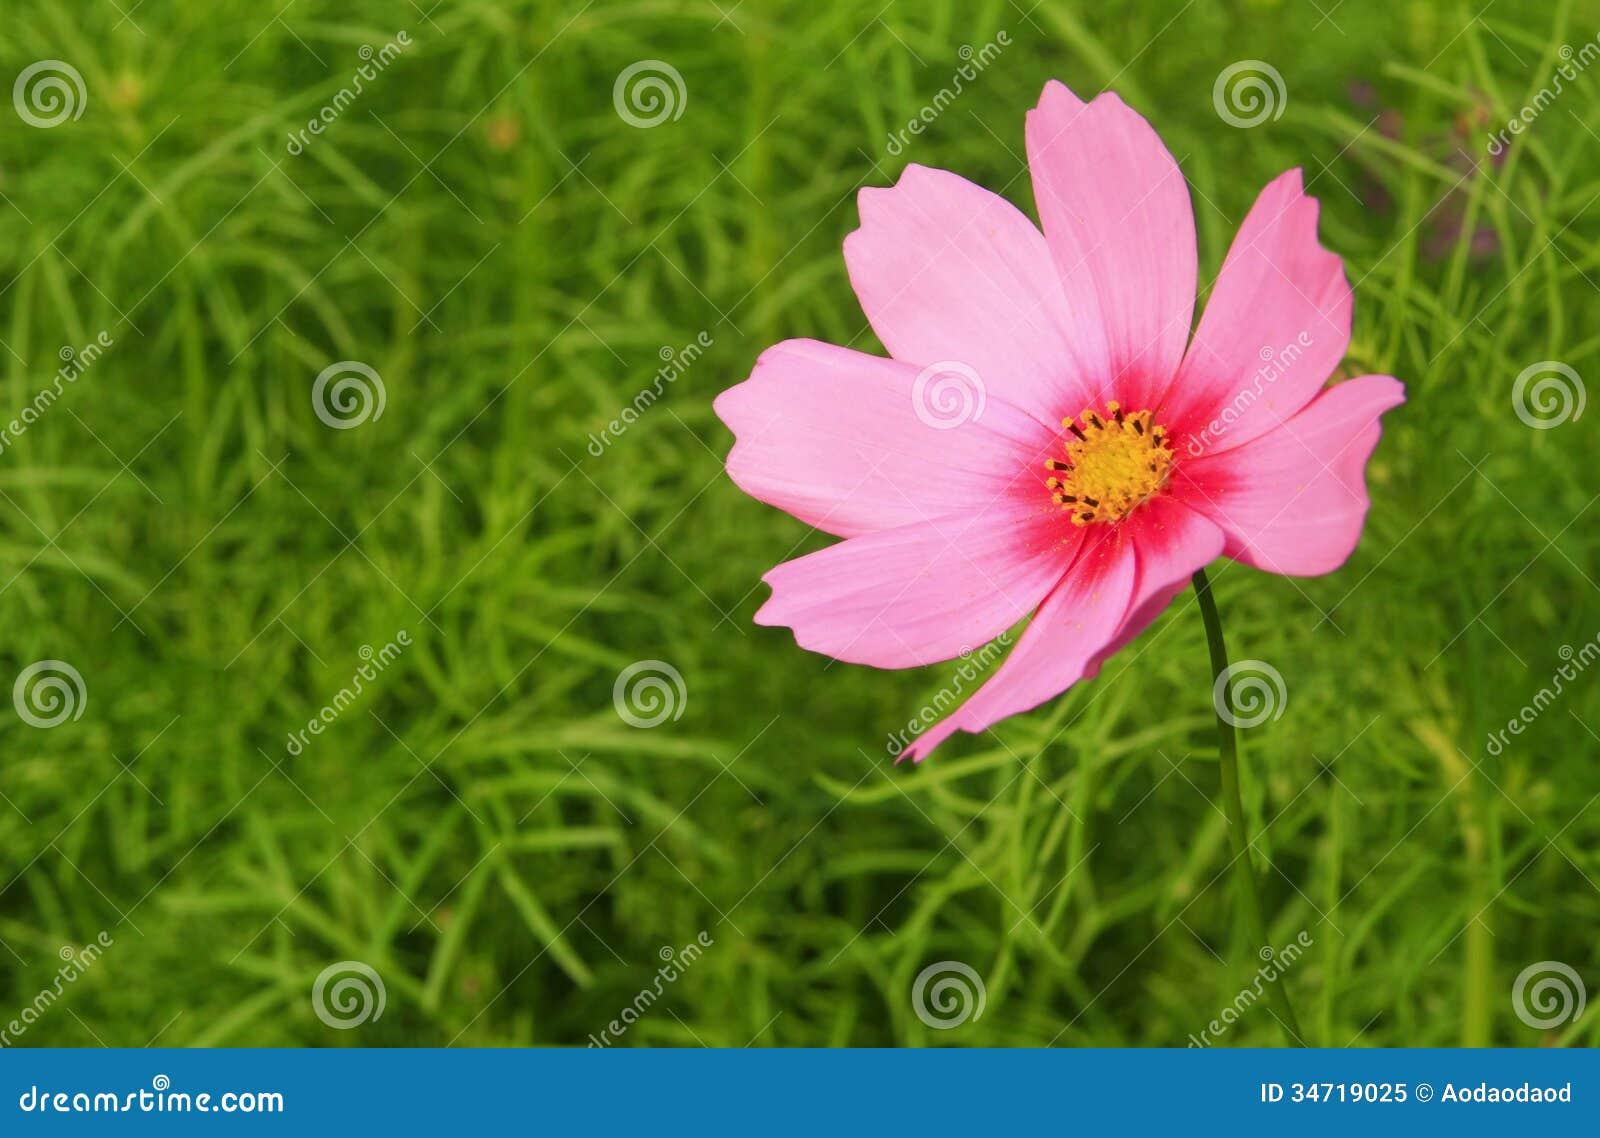 Pink cosmos flower stock image image of flora beautiful 34719025 pink cosmos flower mightylinksfo